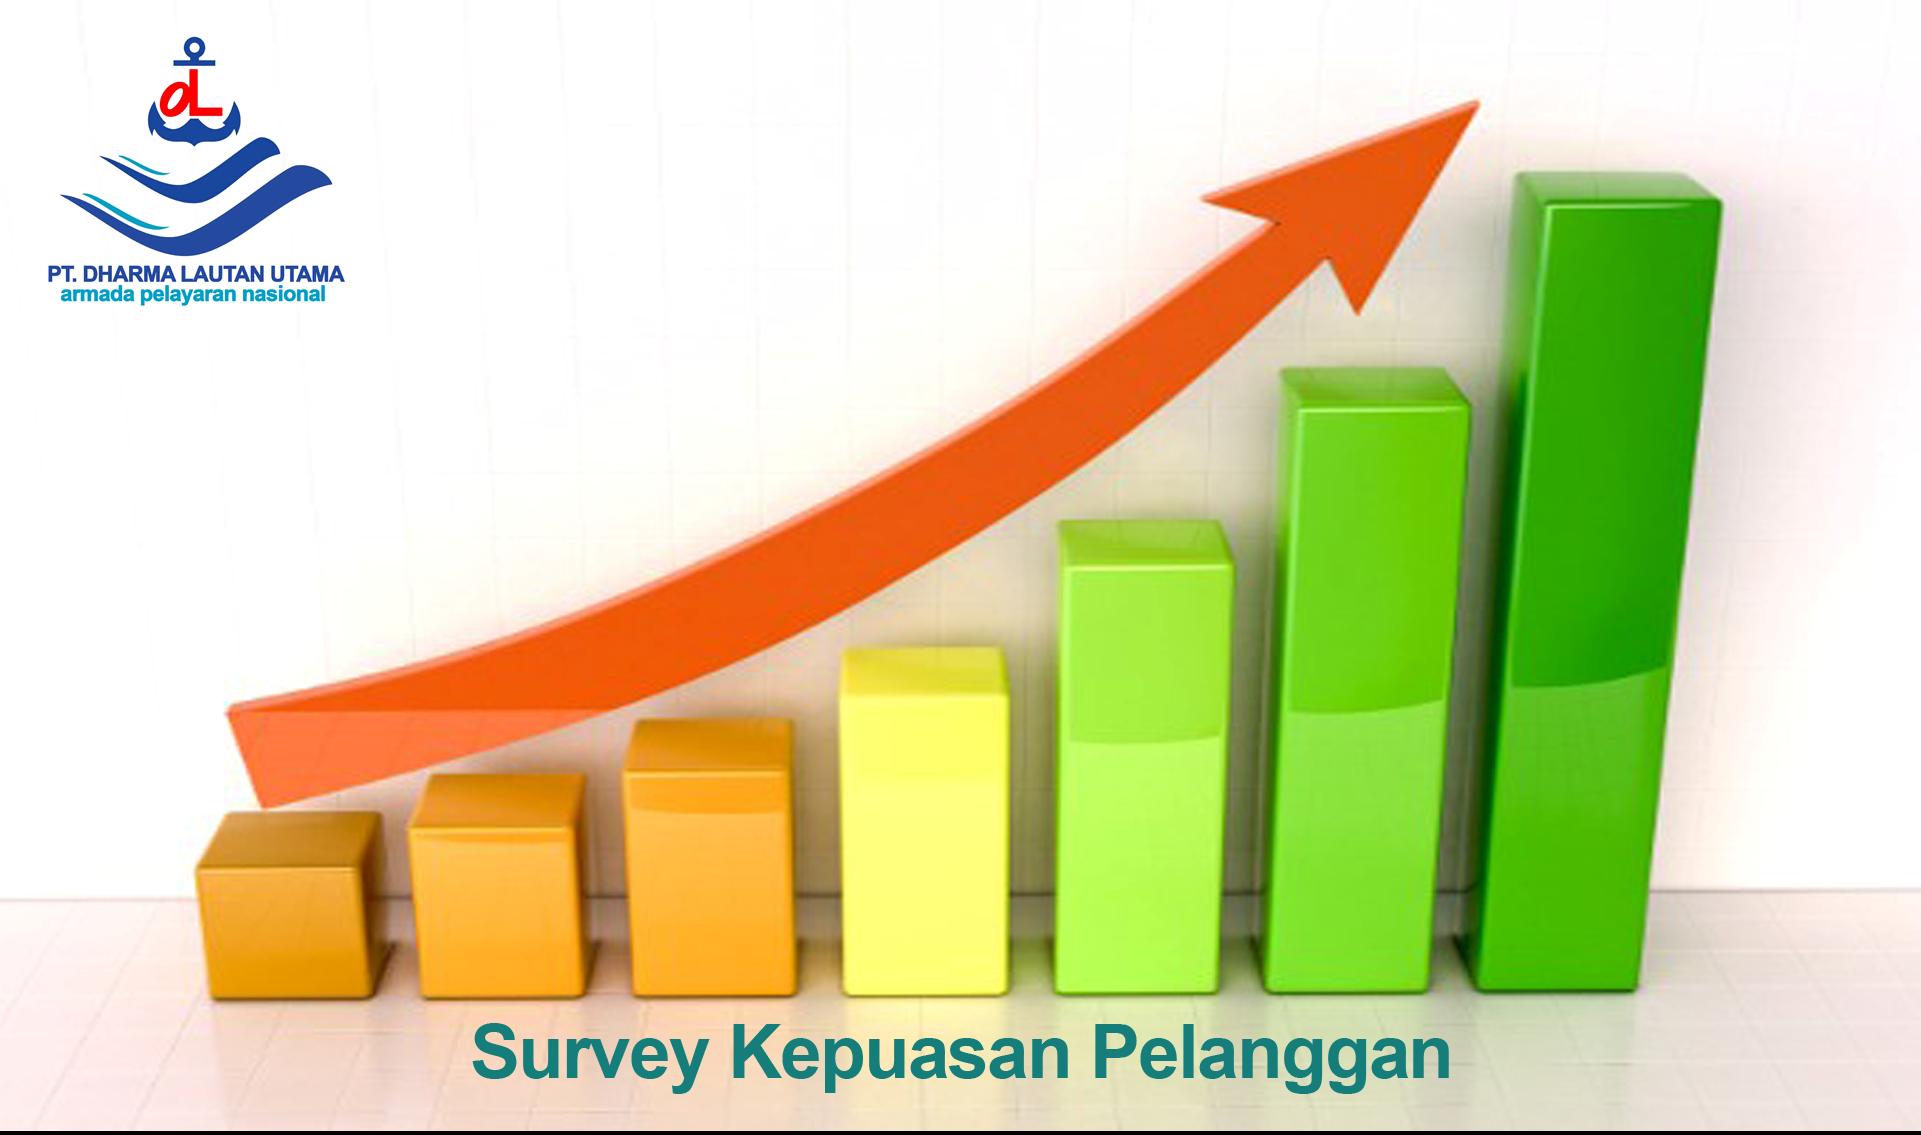 Pengukuran indeks kepuasan pelanggan PT. Dharma Lautan Utama di lintasan Lembar – Padangbai, periode Agustus 2019